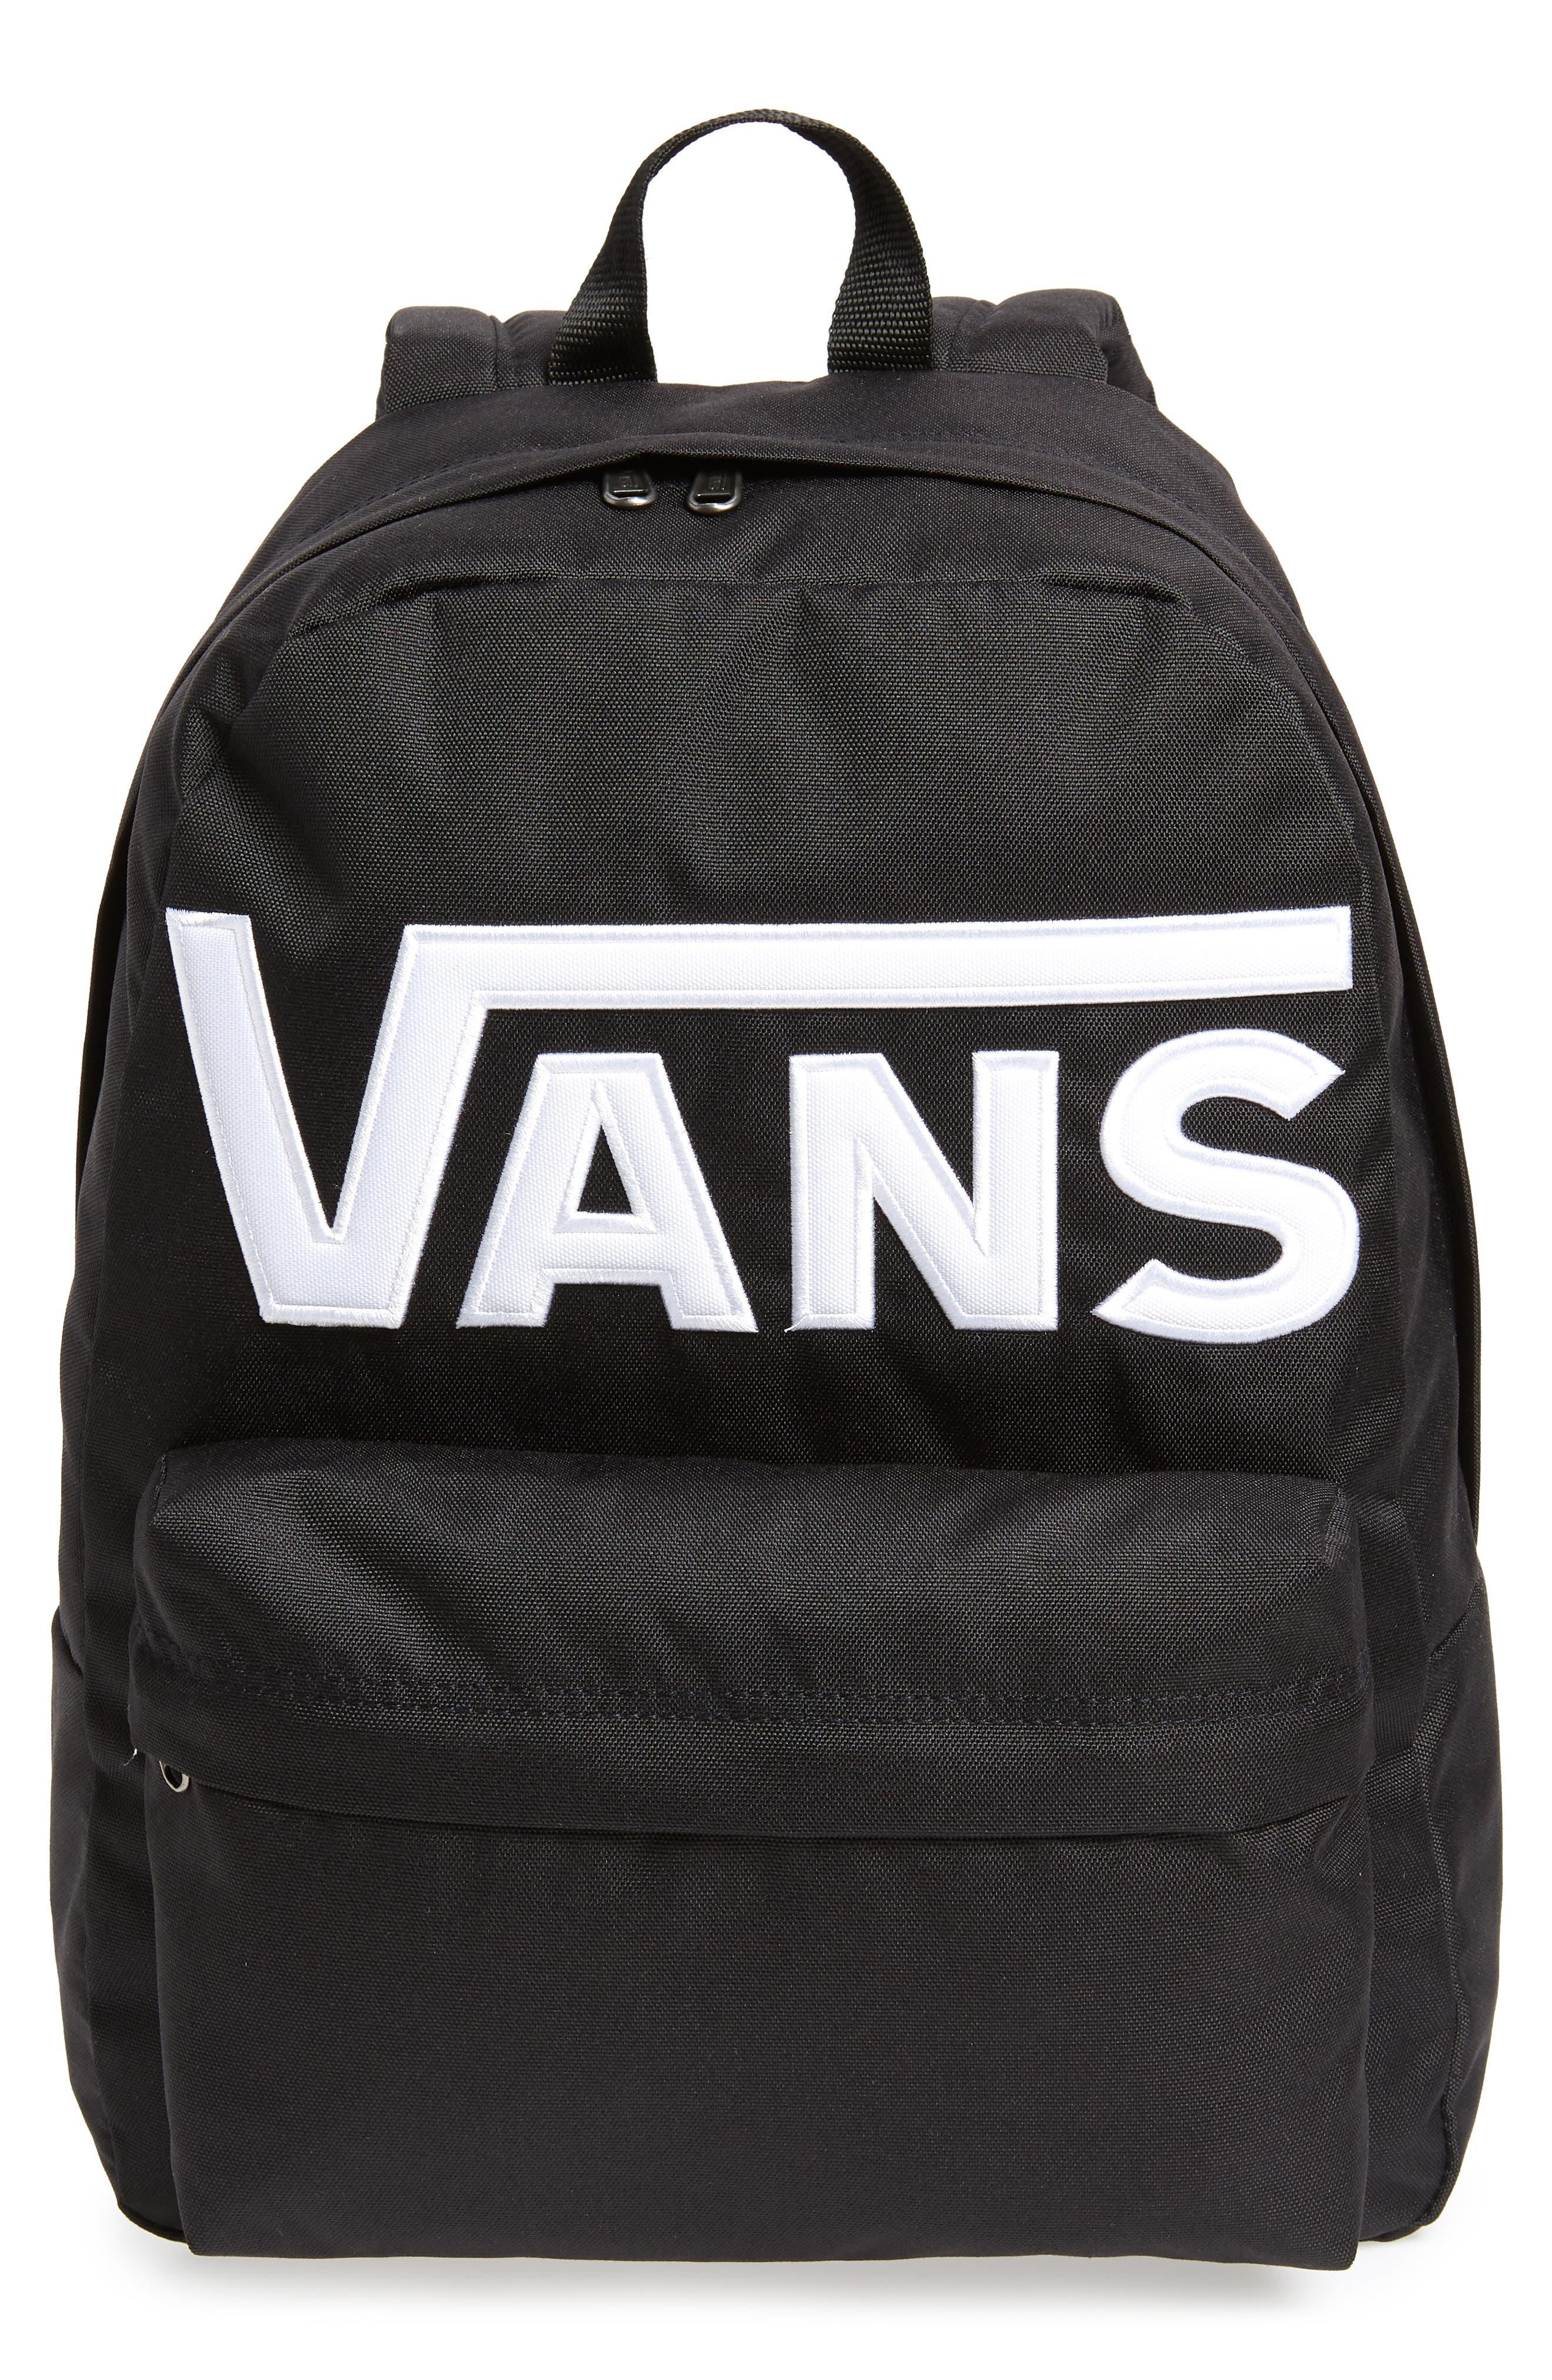 Old Skool II Backpack,                             Main thumbnail 1, color,                             Black/ White